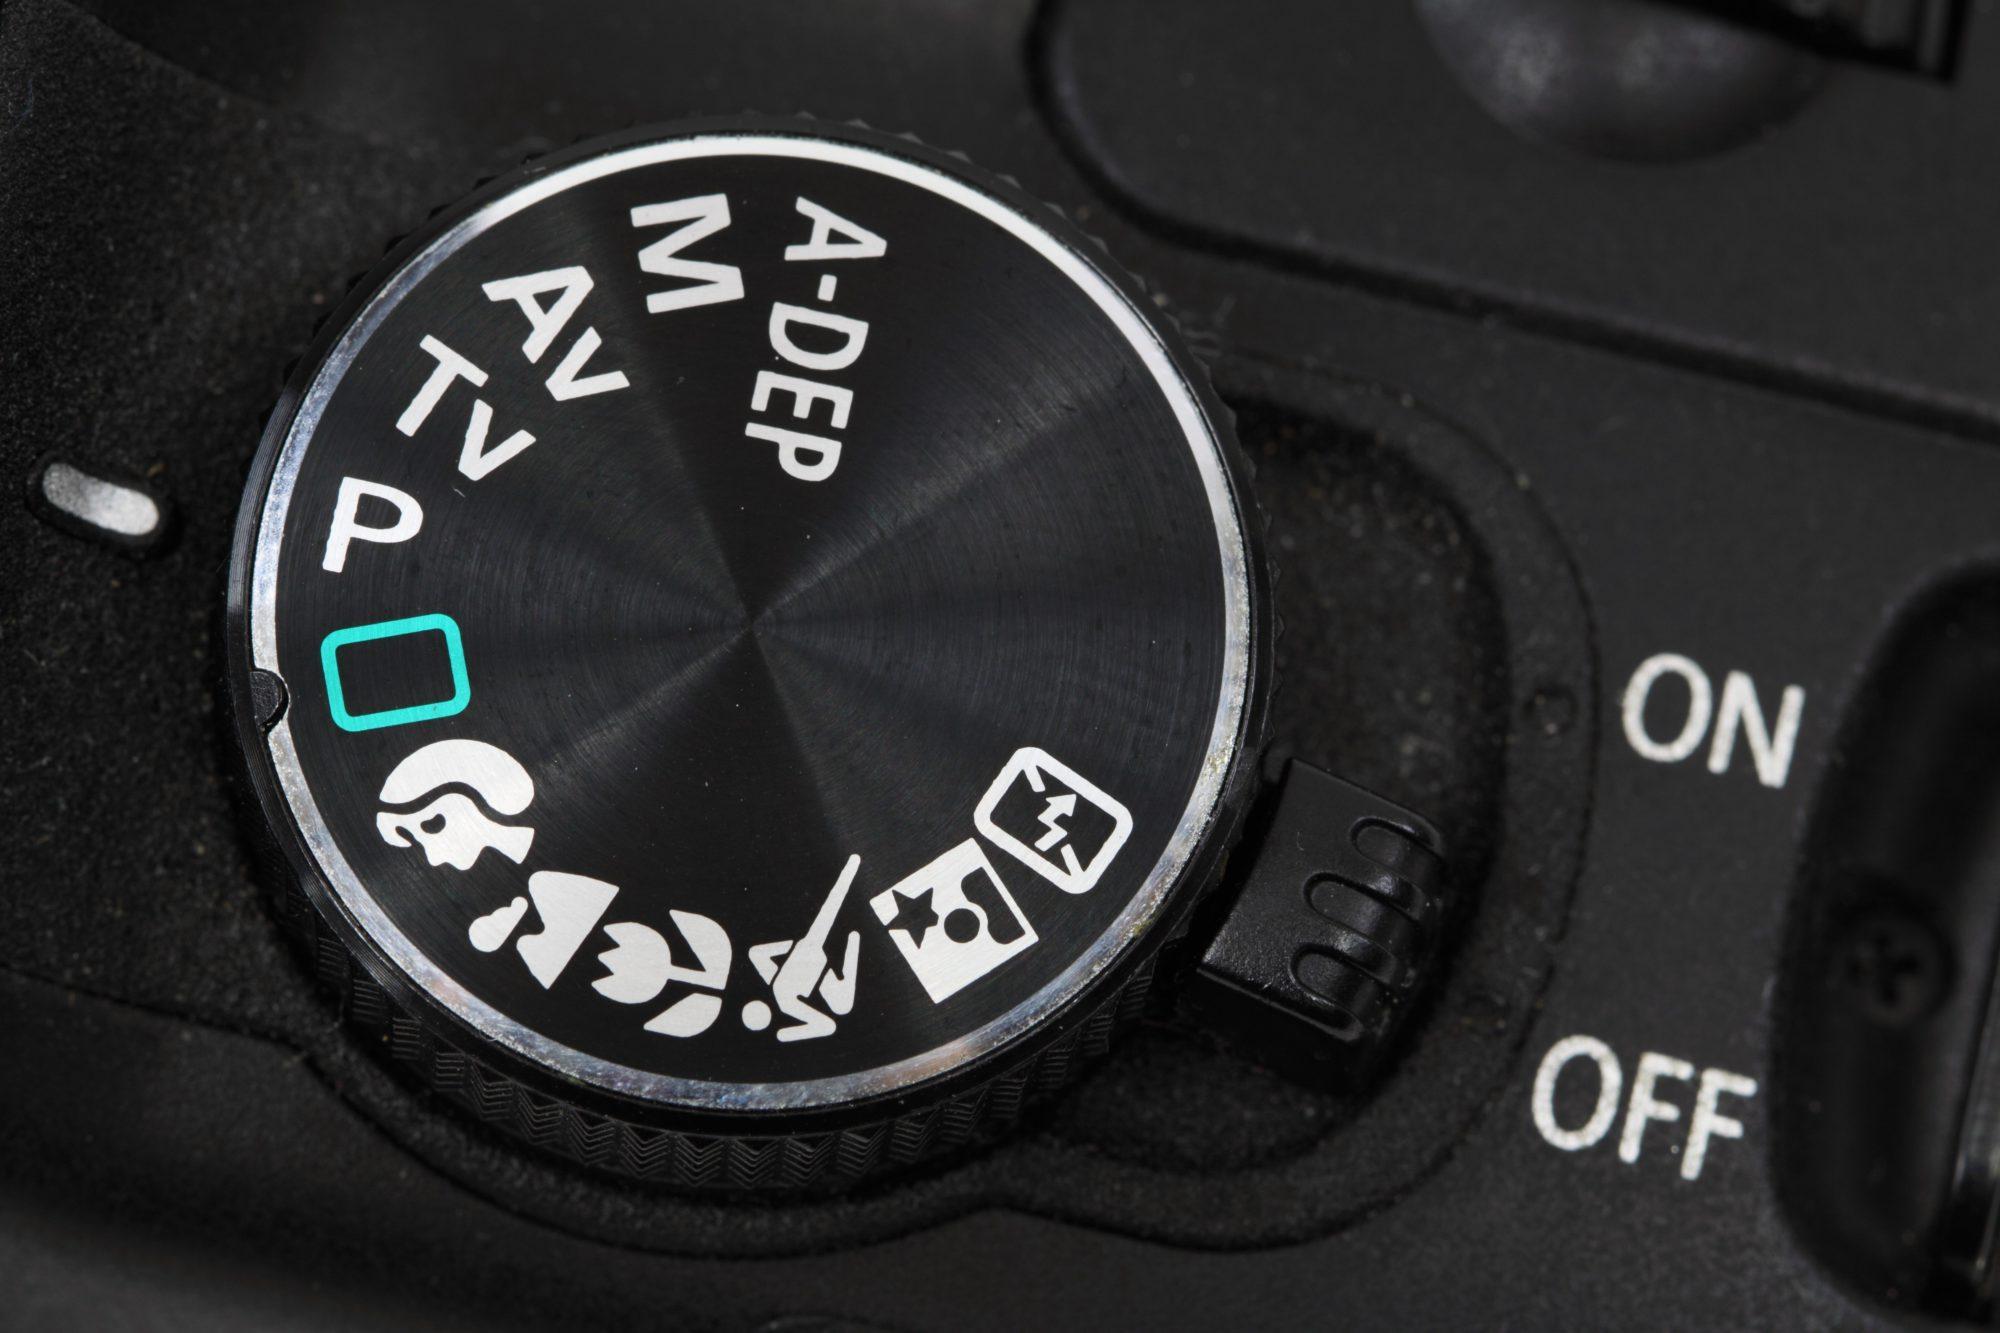 Filmprodukion, Kamera Modusrad, STRAINX